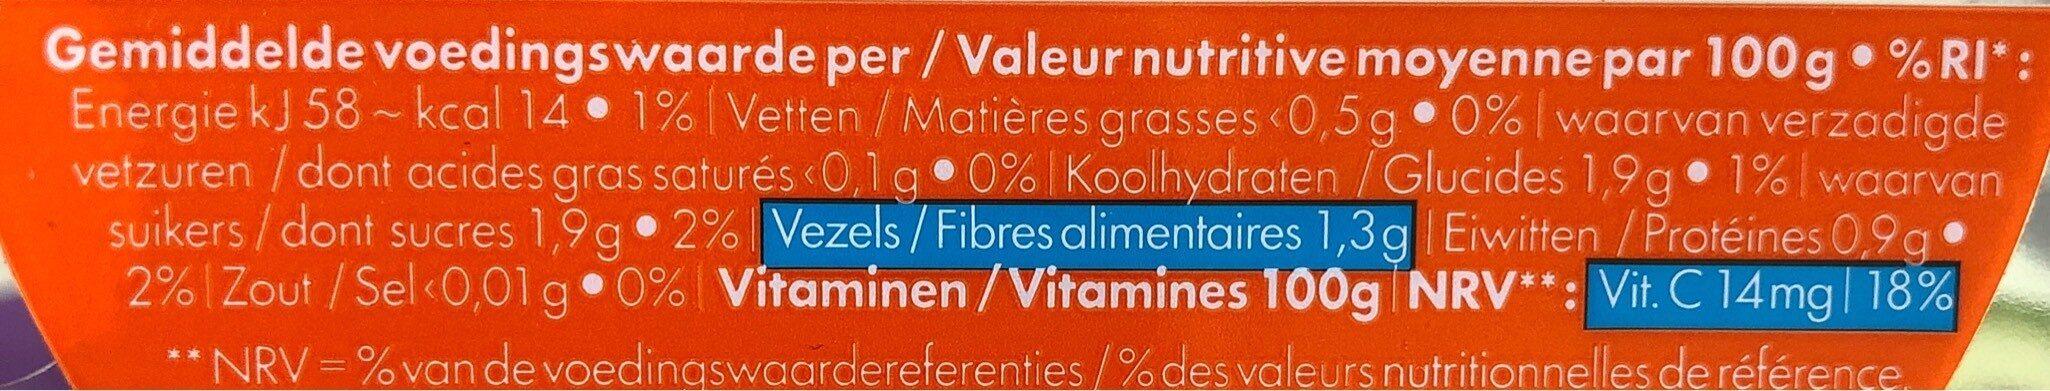 Tomates cerises - Voedingswaarden - fr